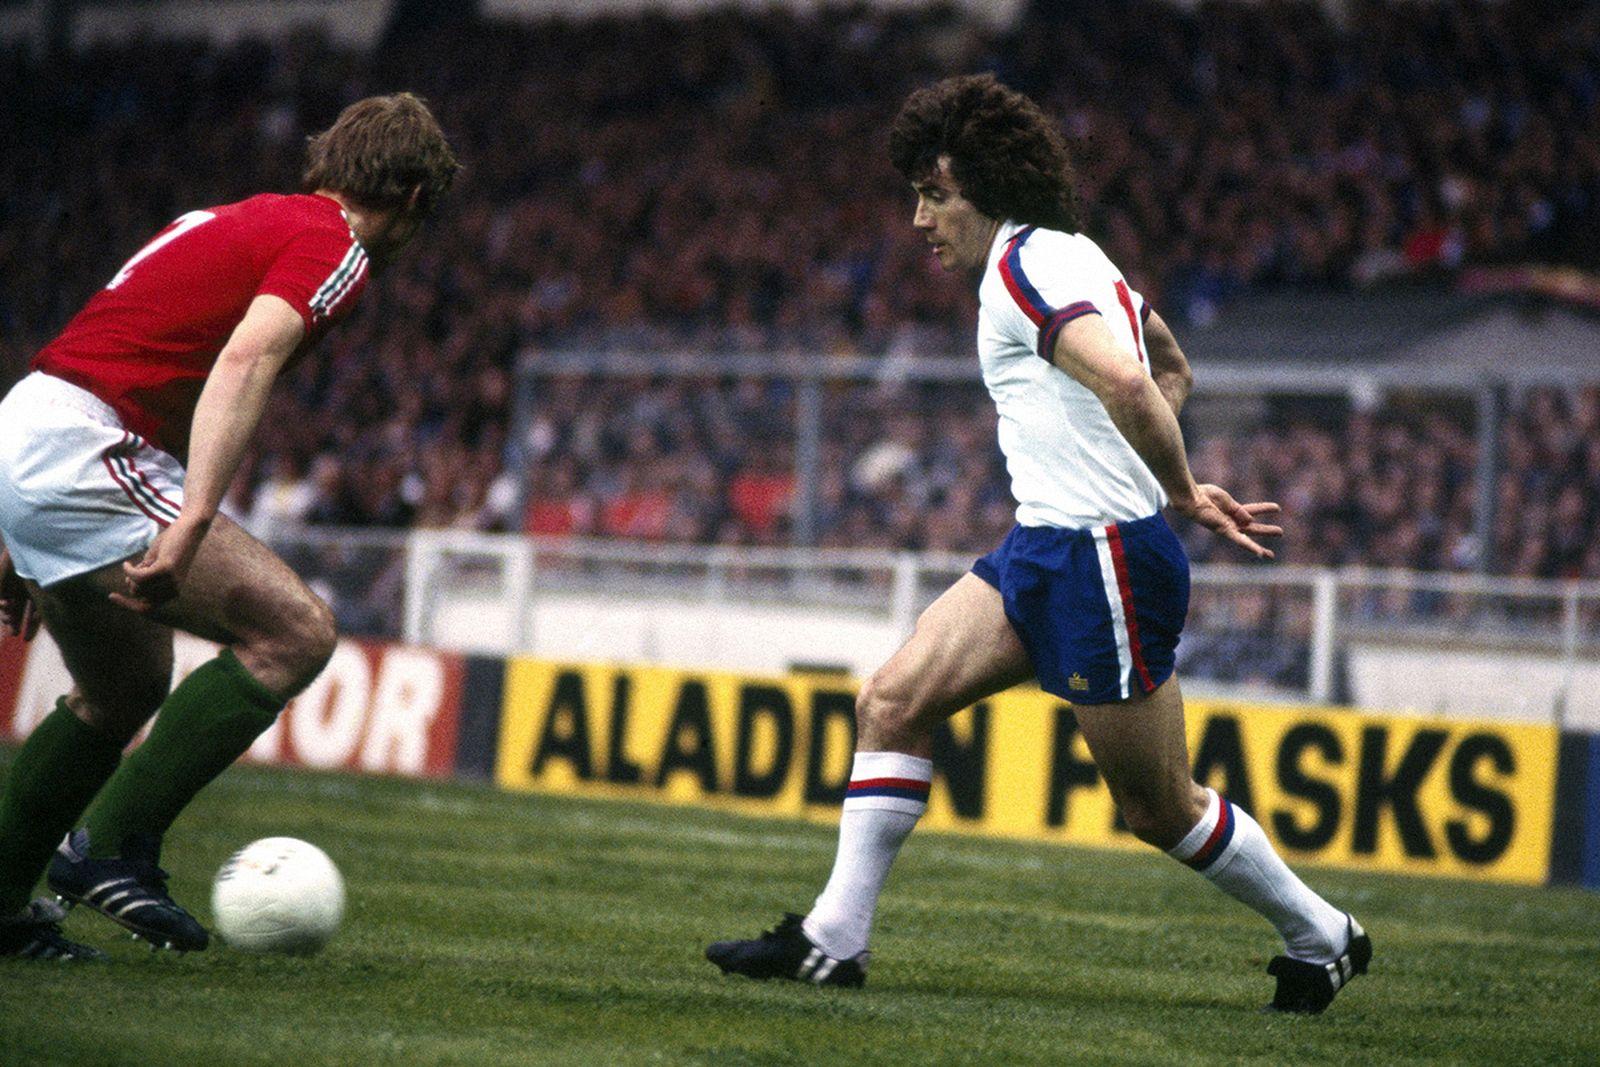 24/5/1978 International Football. England v Hungary. Kevin Keegan